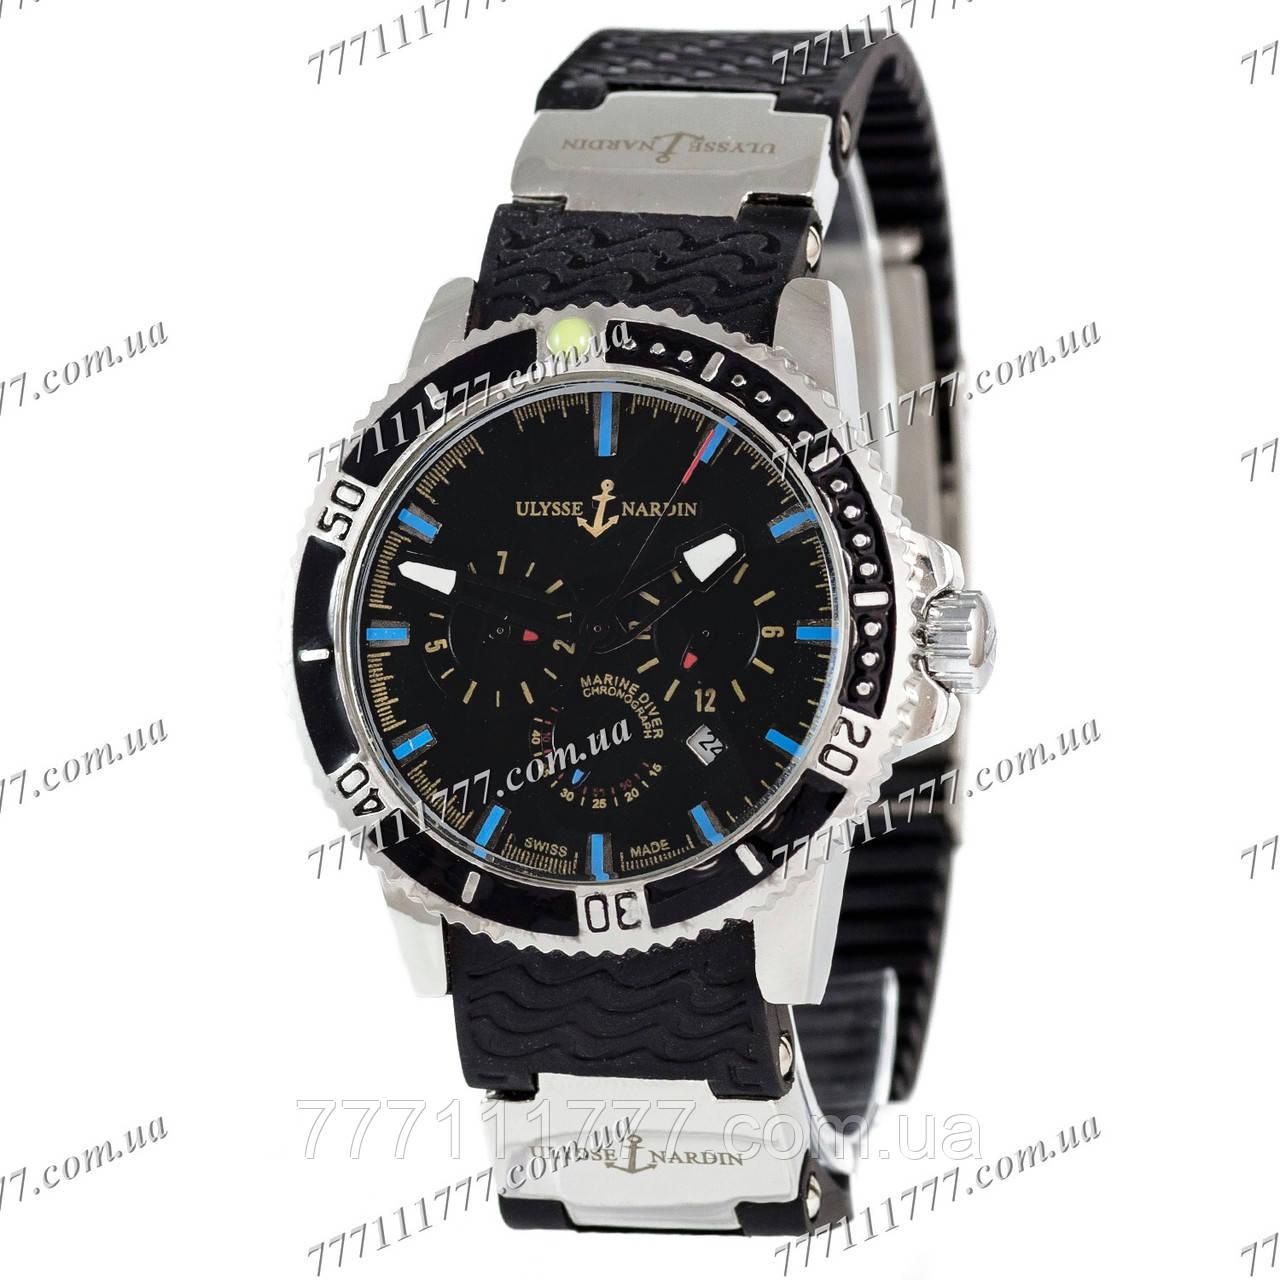 Часы мужские наручные Ulysse Nardin SK-1023-0098  продажа, цена в ... 97bff2ce61f